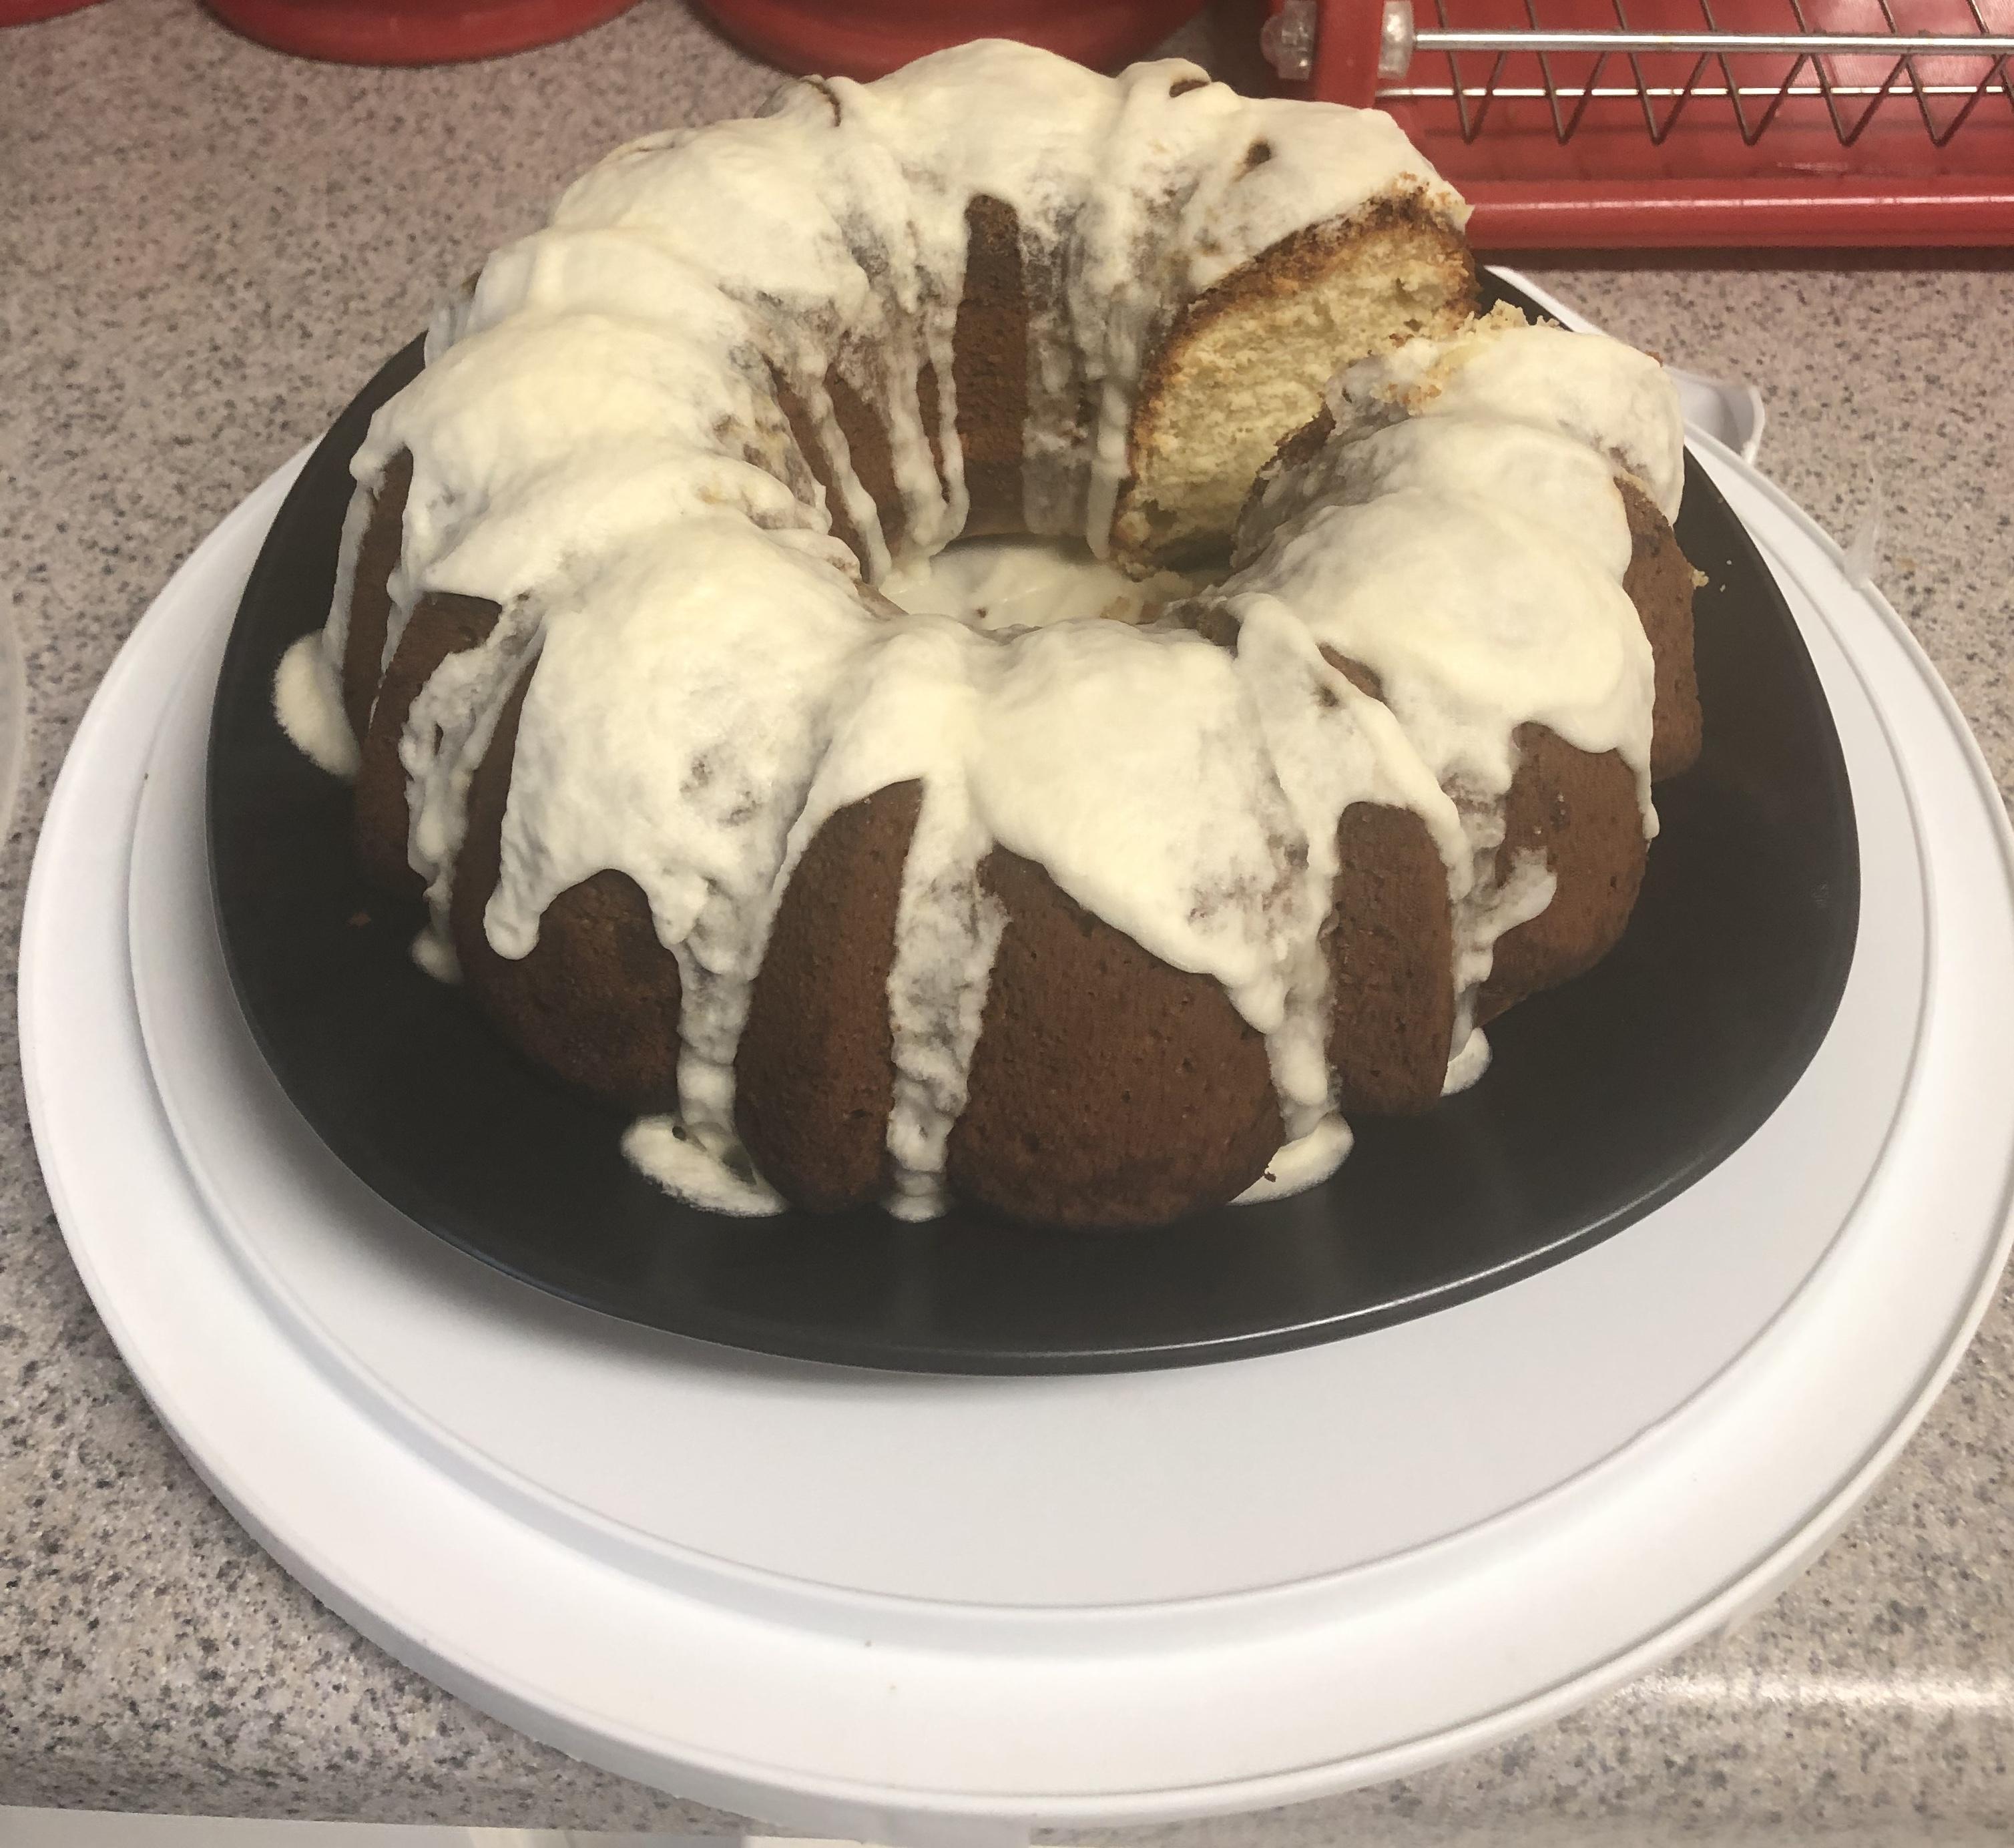 Glazed Lemon Supreme Pound Cake Veronica Williams